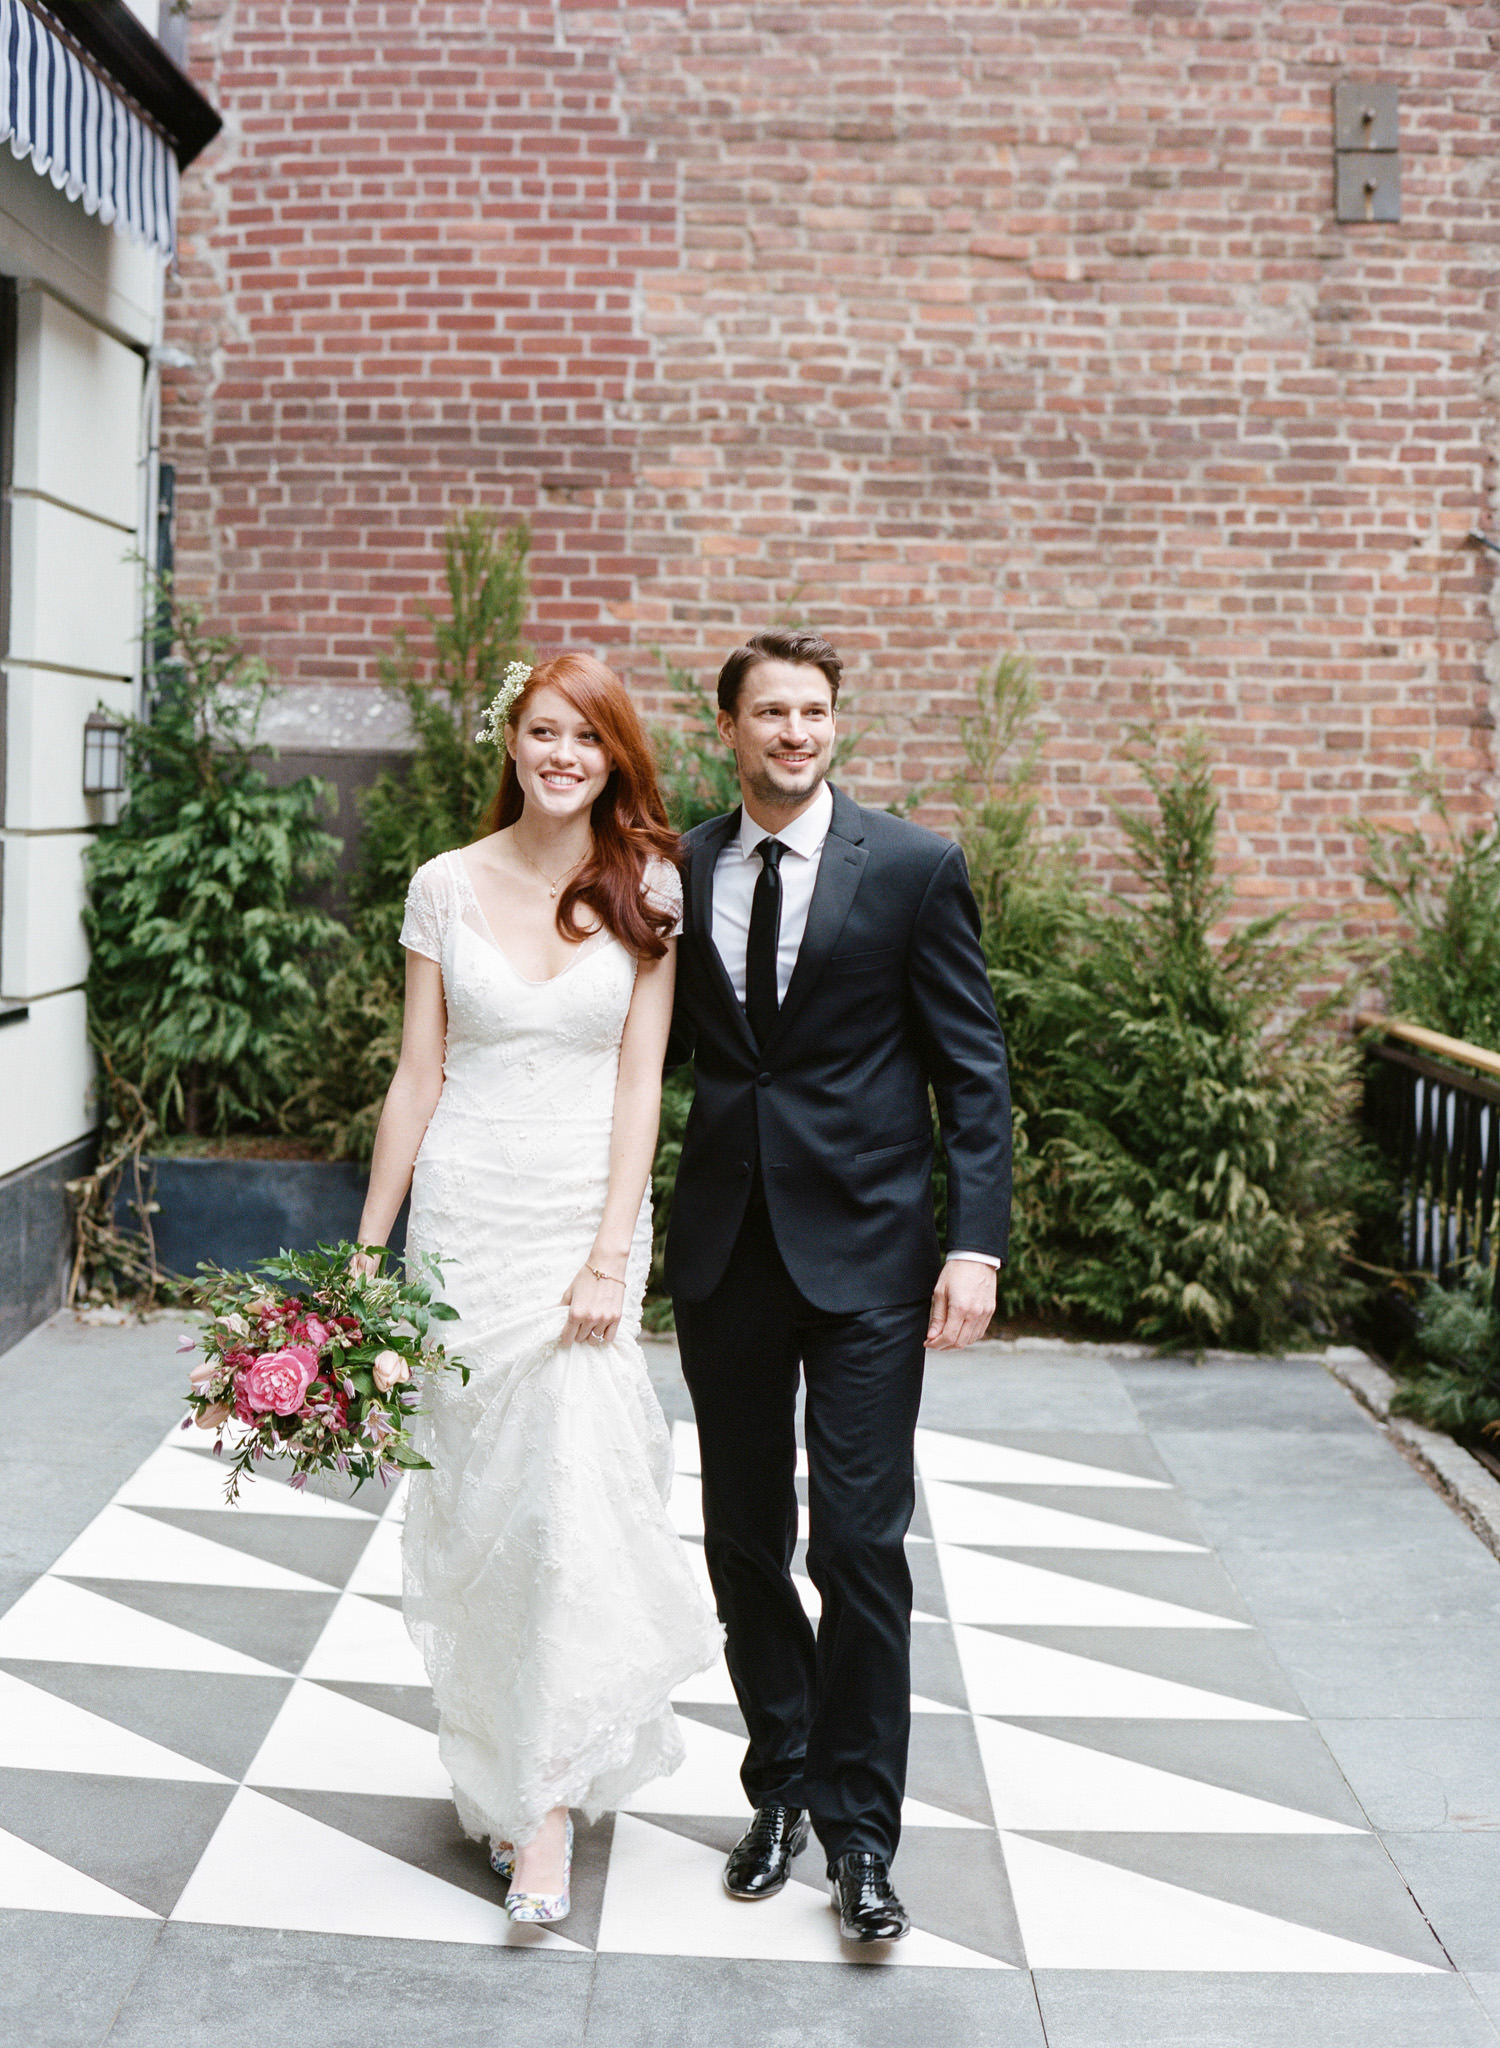 City Hall Wedding New York City Manhattan City Hall-14